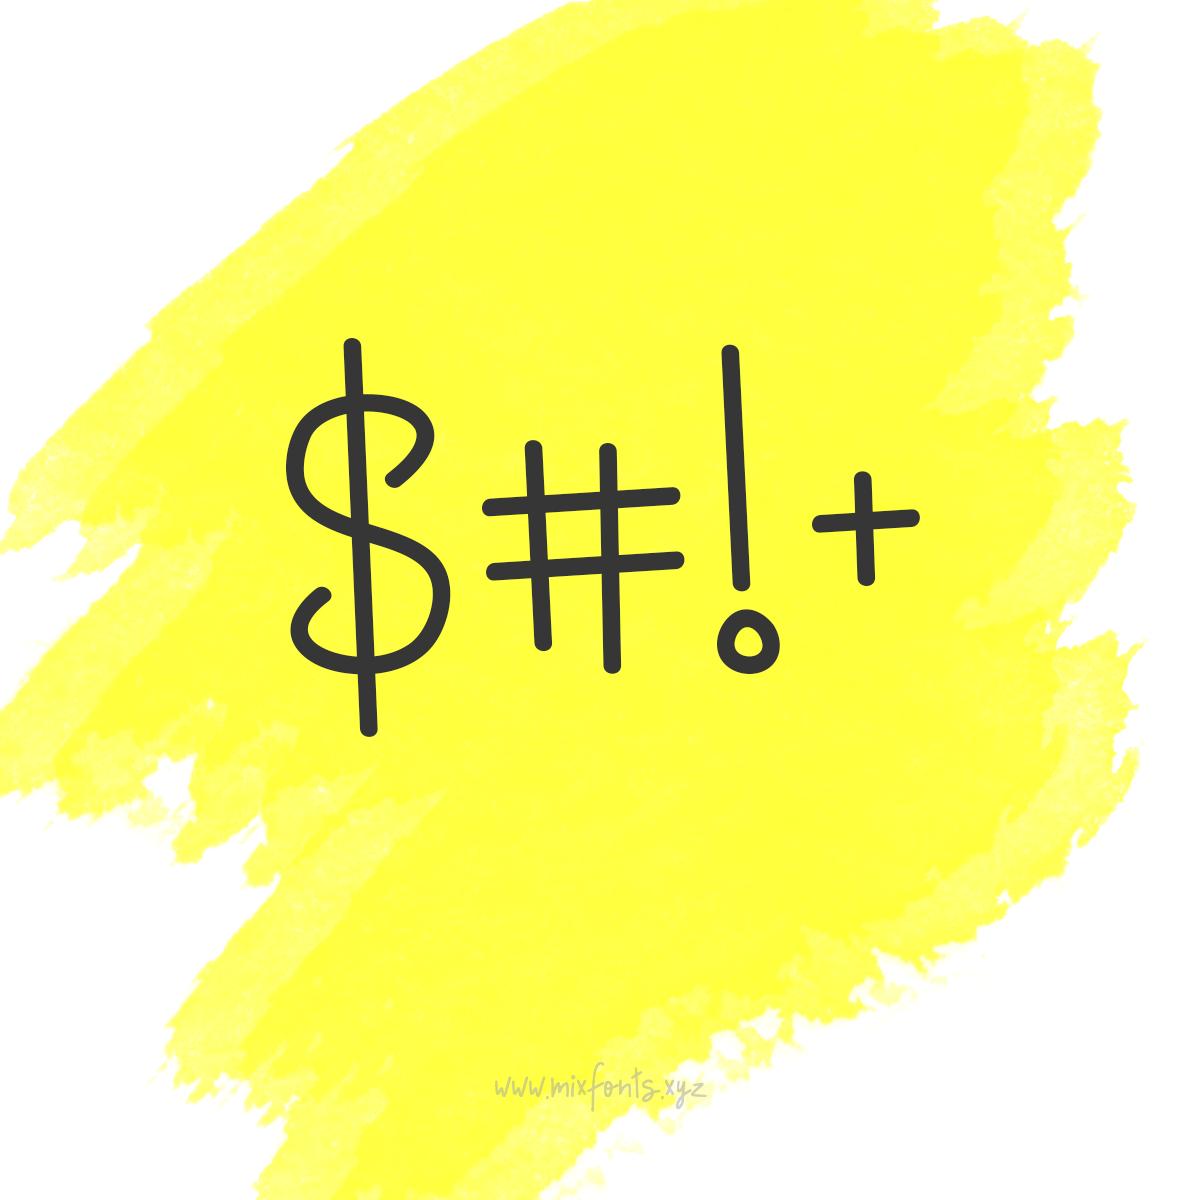 Turvy - A Unique Font to Replace Comic Sans example image 5